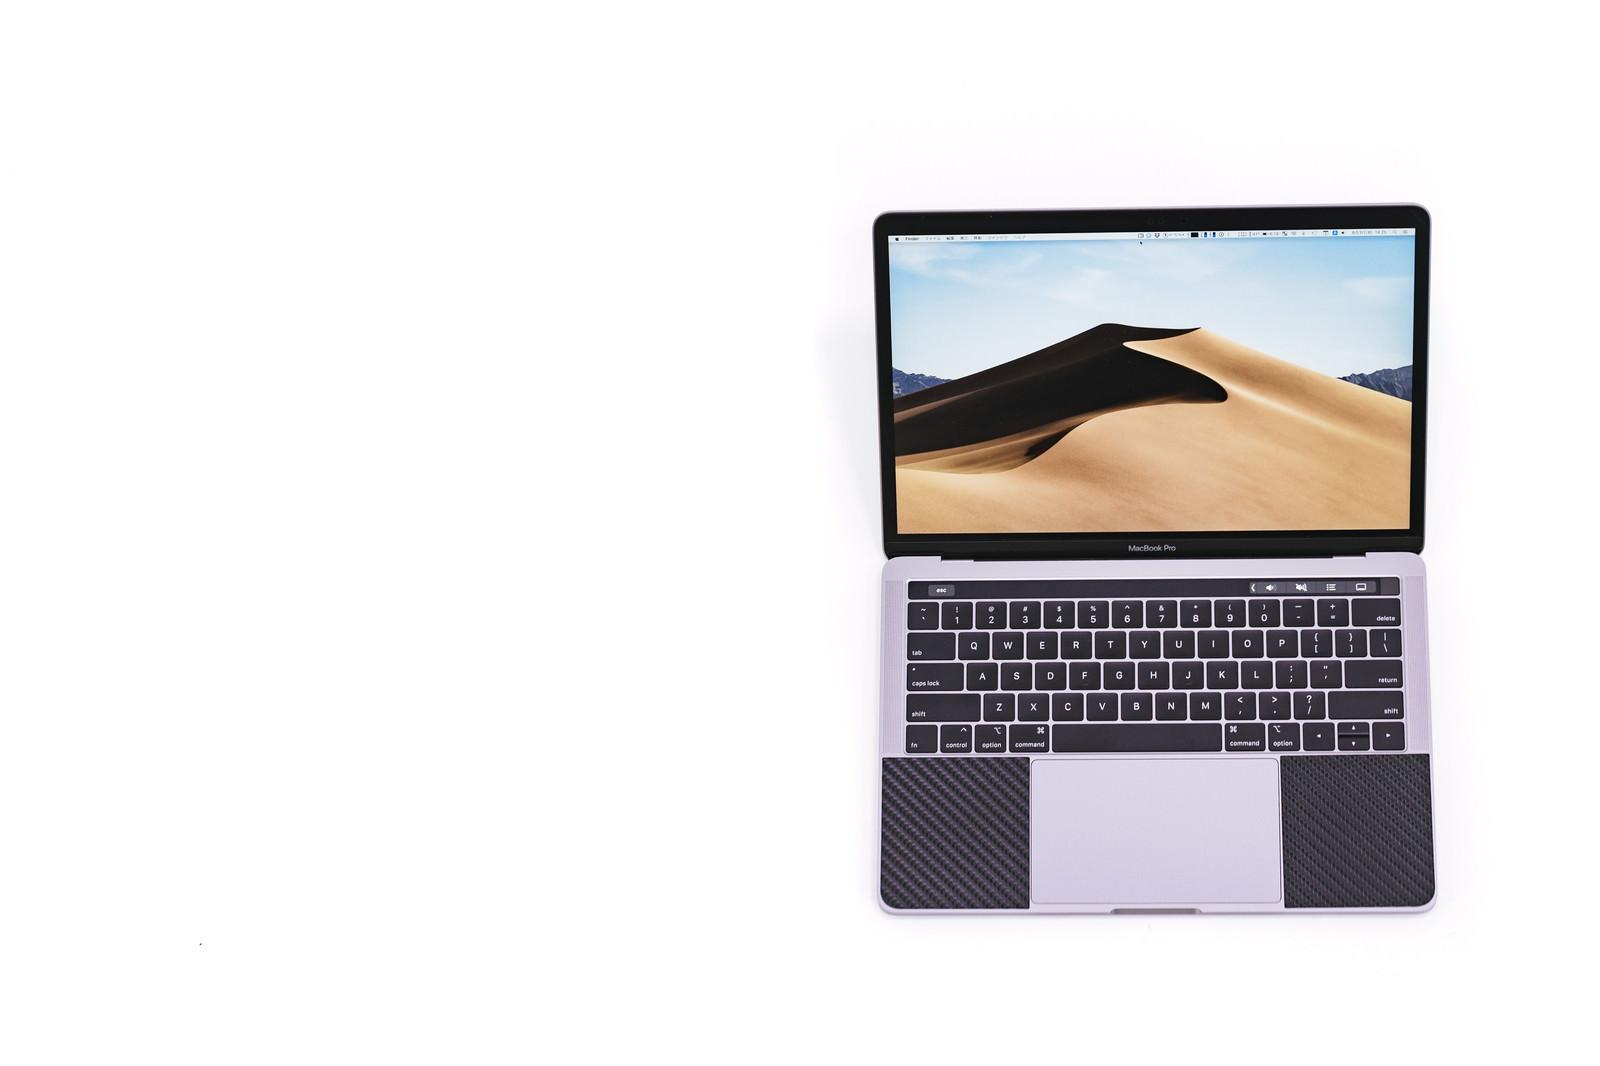 GoriIMGL9732 TP V macbook pro 13